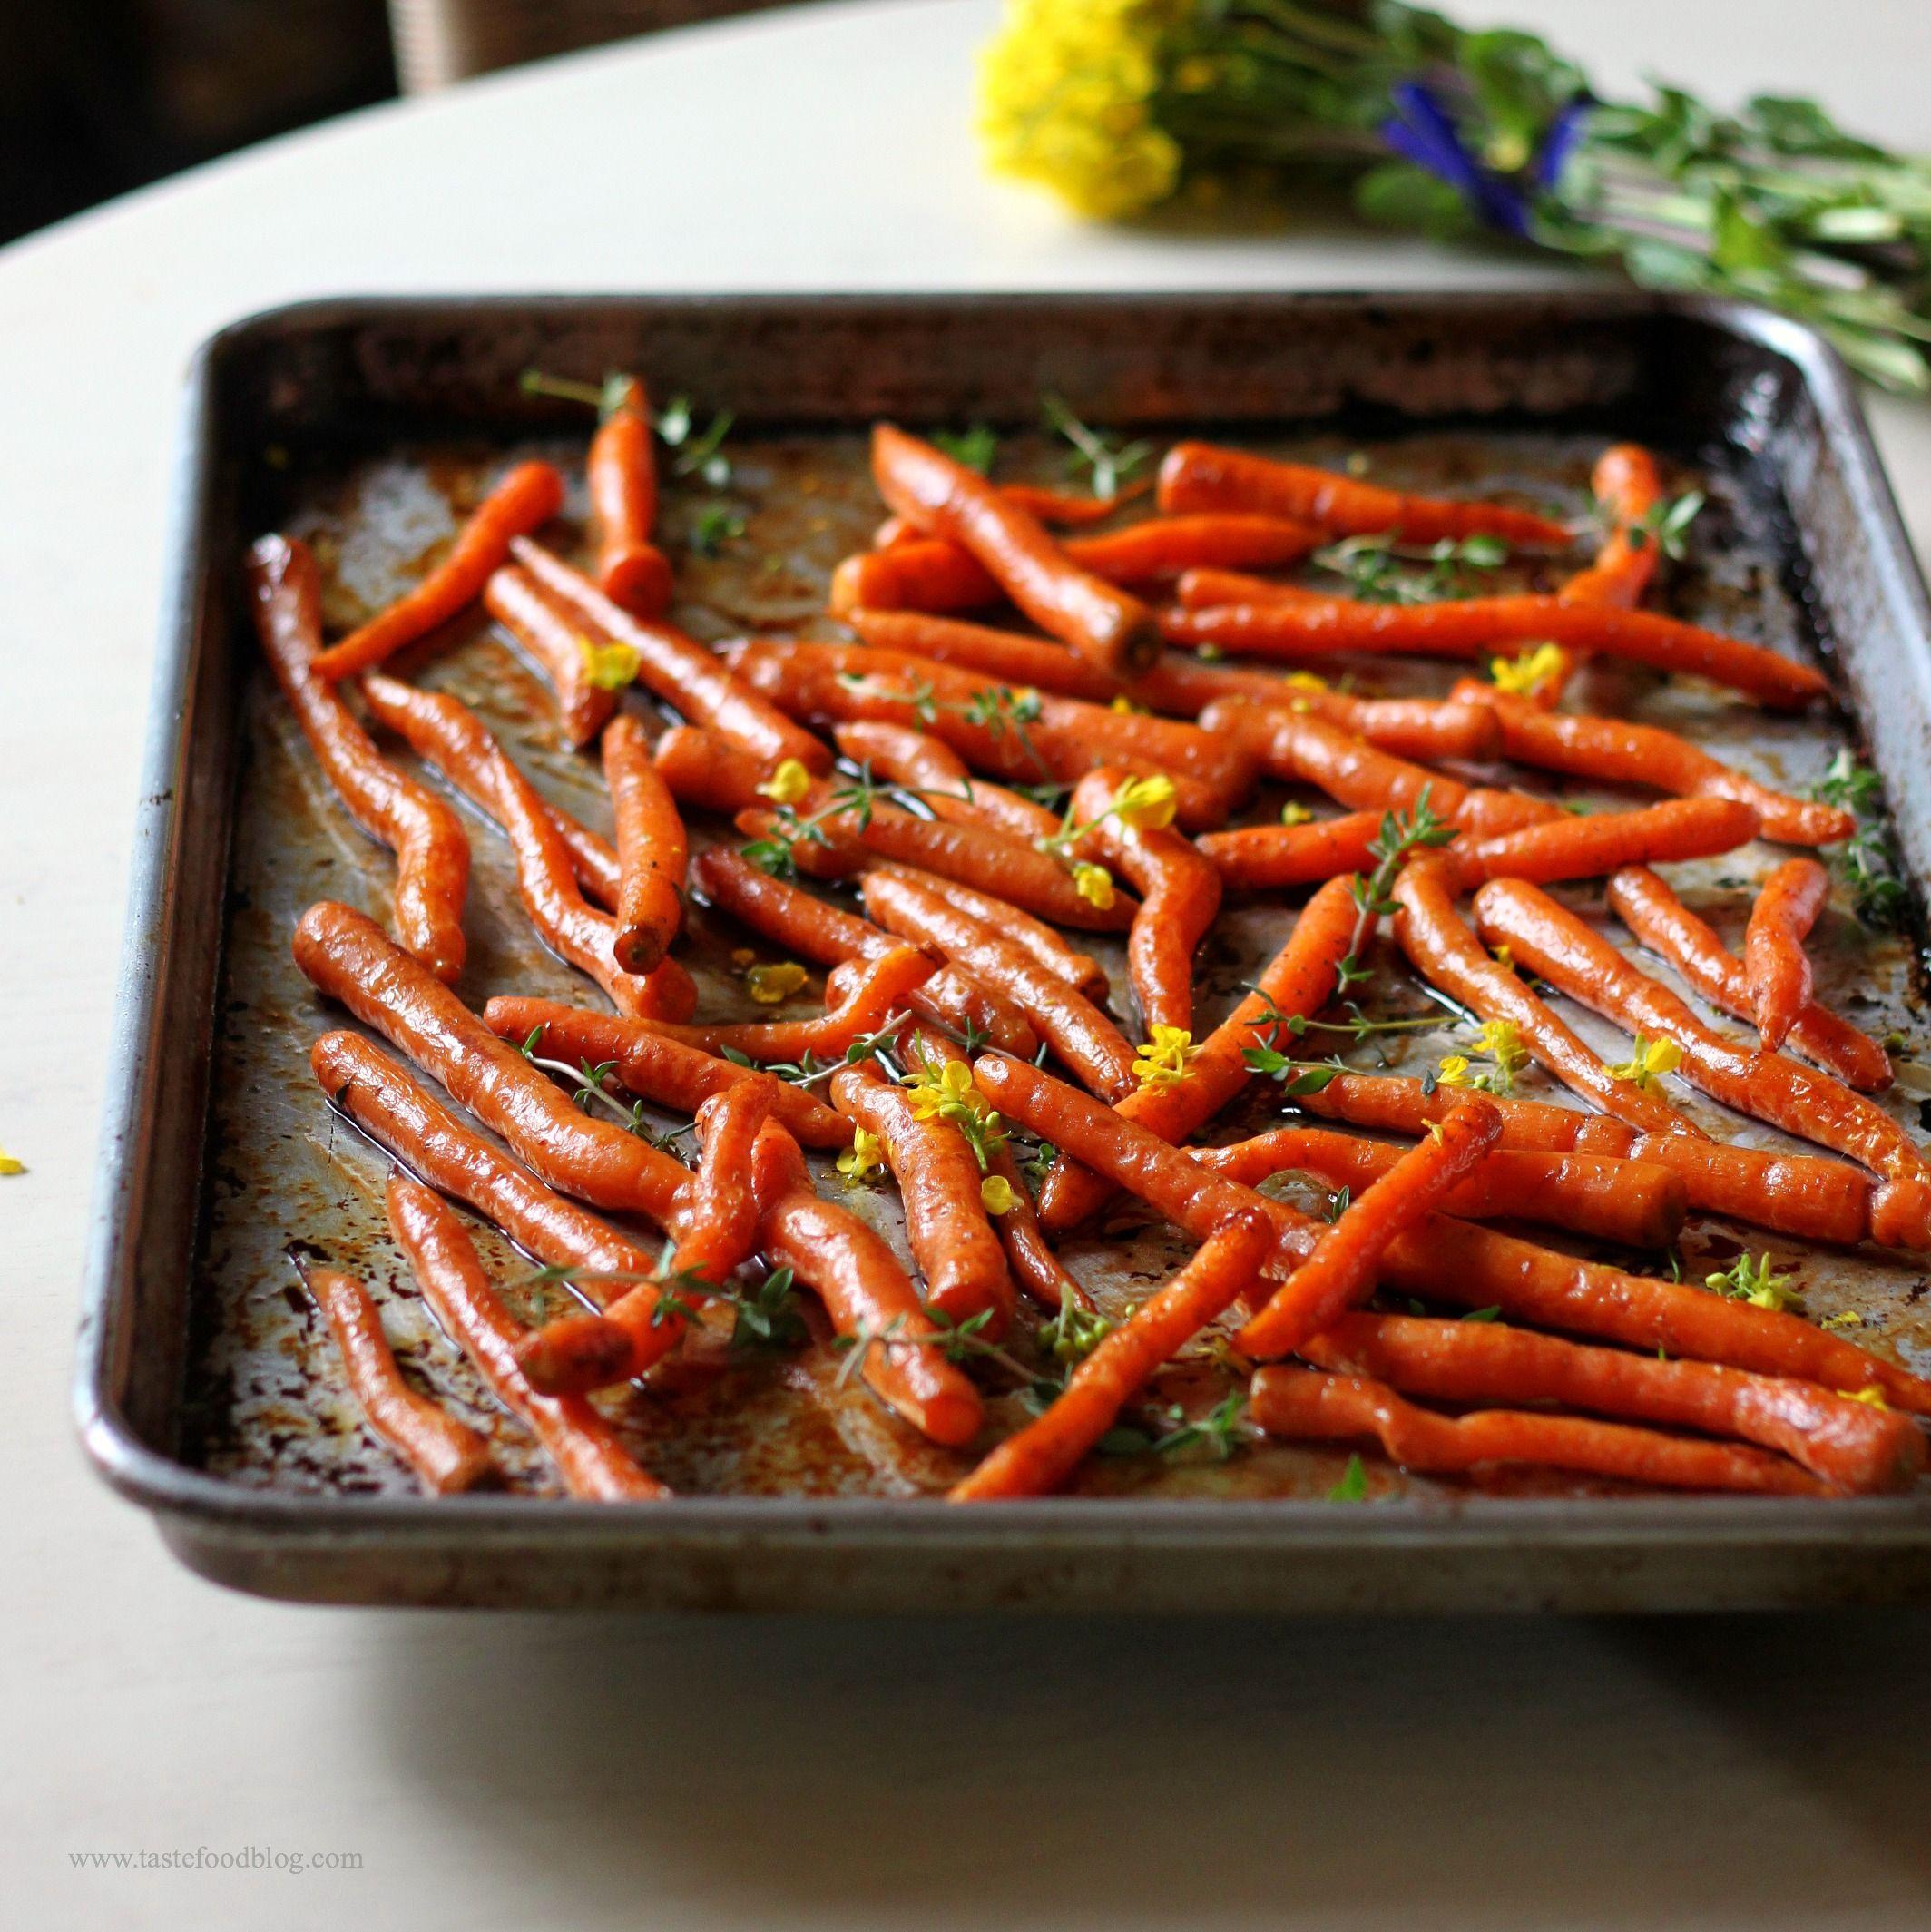 Balsamic Roasted Carrots So Pretty Balsamic Carrots Roasted